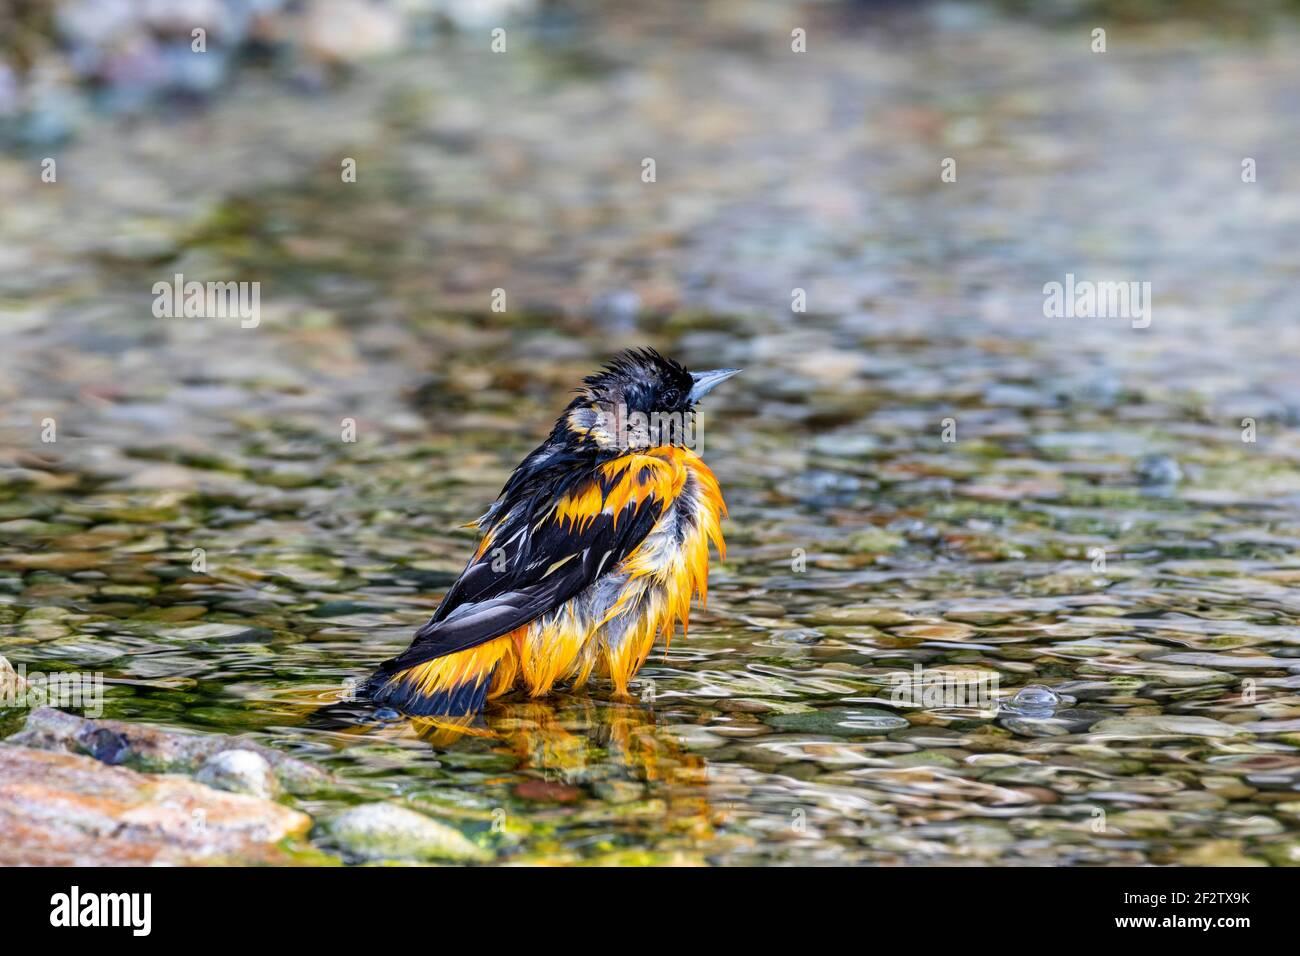 01611-10410 Baltimore Oriole (Icterus galbula) männliches Baden Marion Co. IL Stockfoto